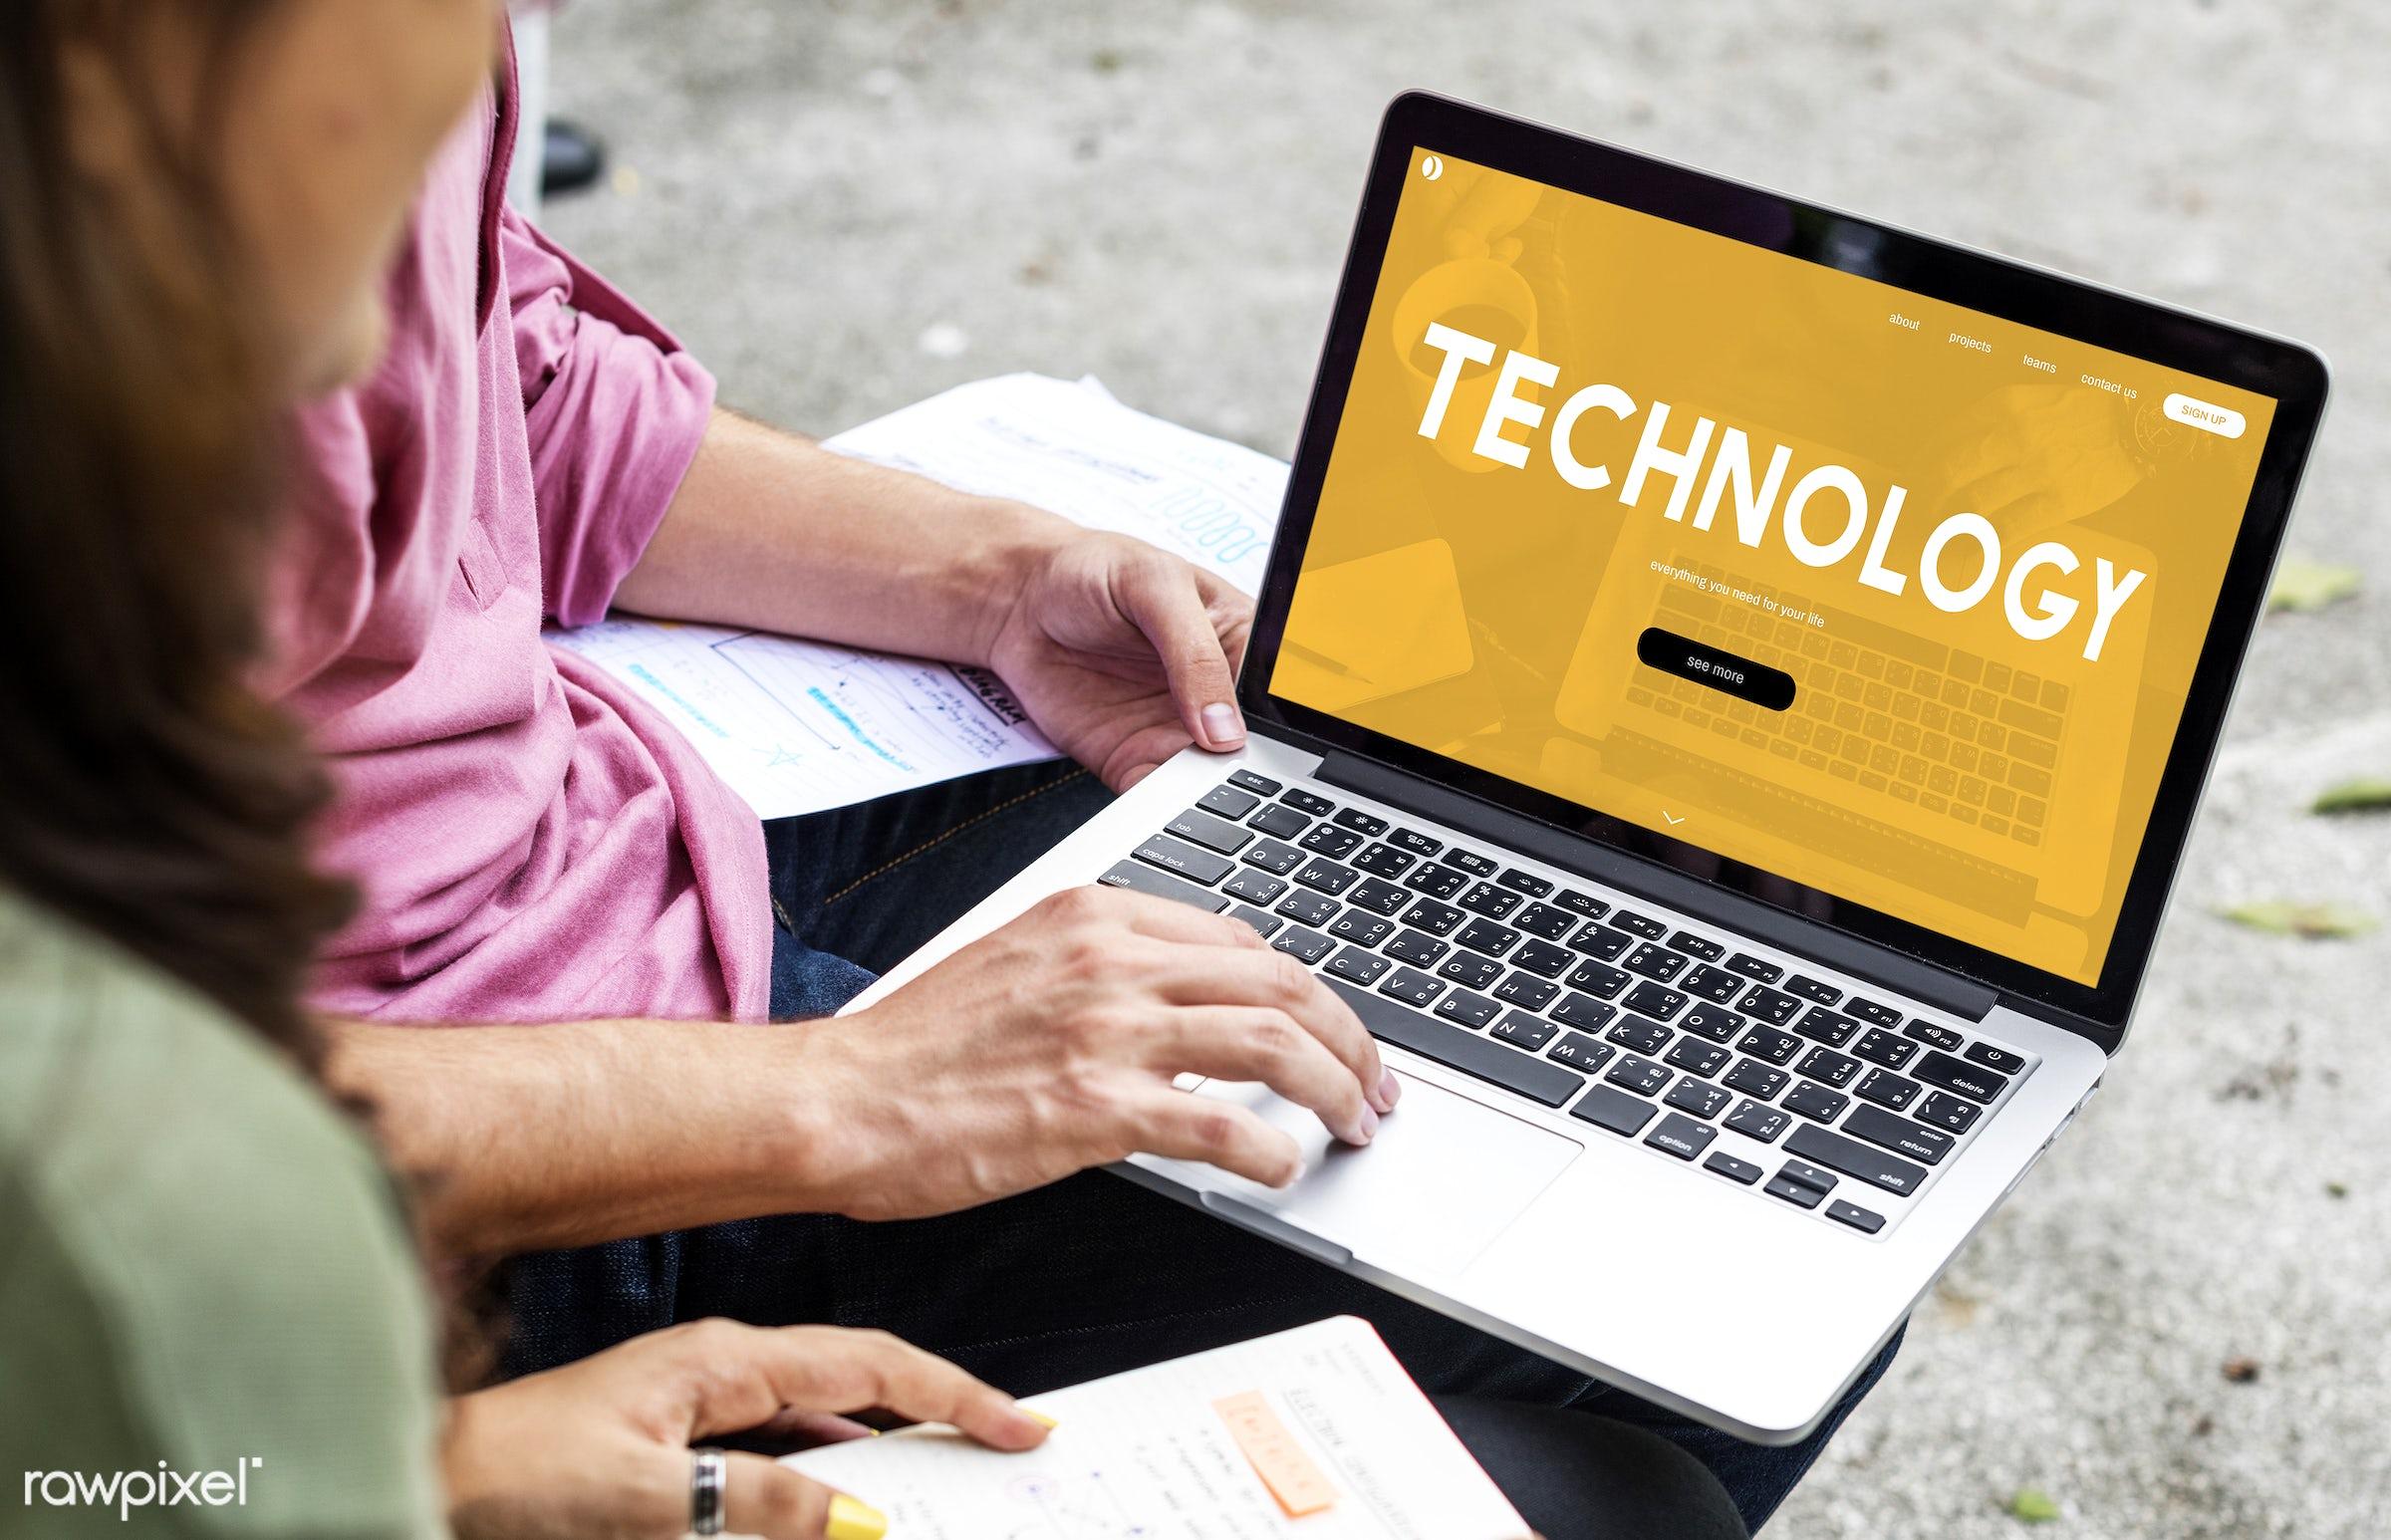 asian, blog, browsing, caucasian, chat, communication, community, connection, content, devices, digital, diversity, element...